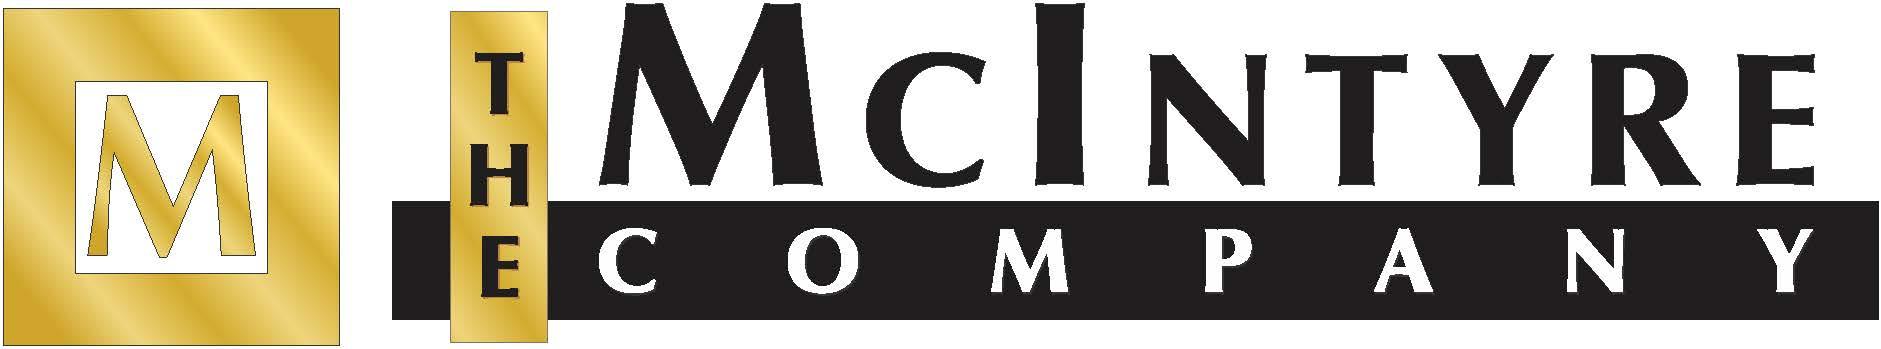 The McIntyre Company